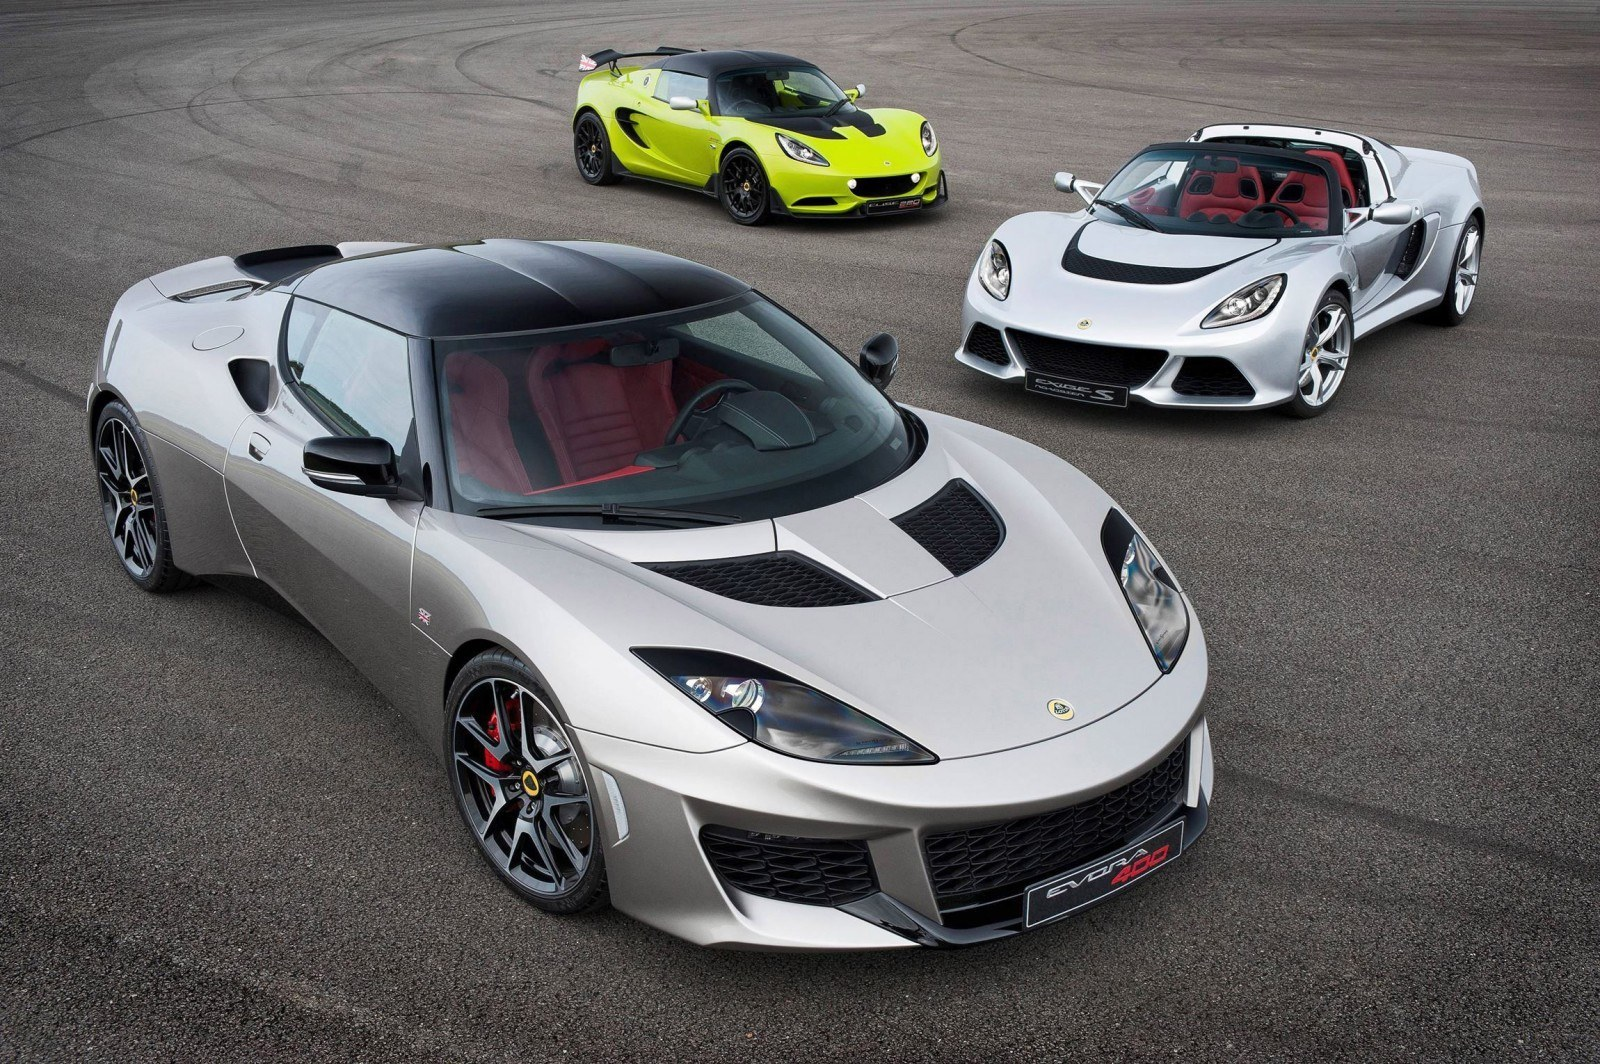 170mph 2016 lotus exige sport 350 is new road legal cup racer car revs. Black Bedroom Furniture Sets. Home Design Ideas